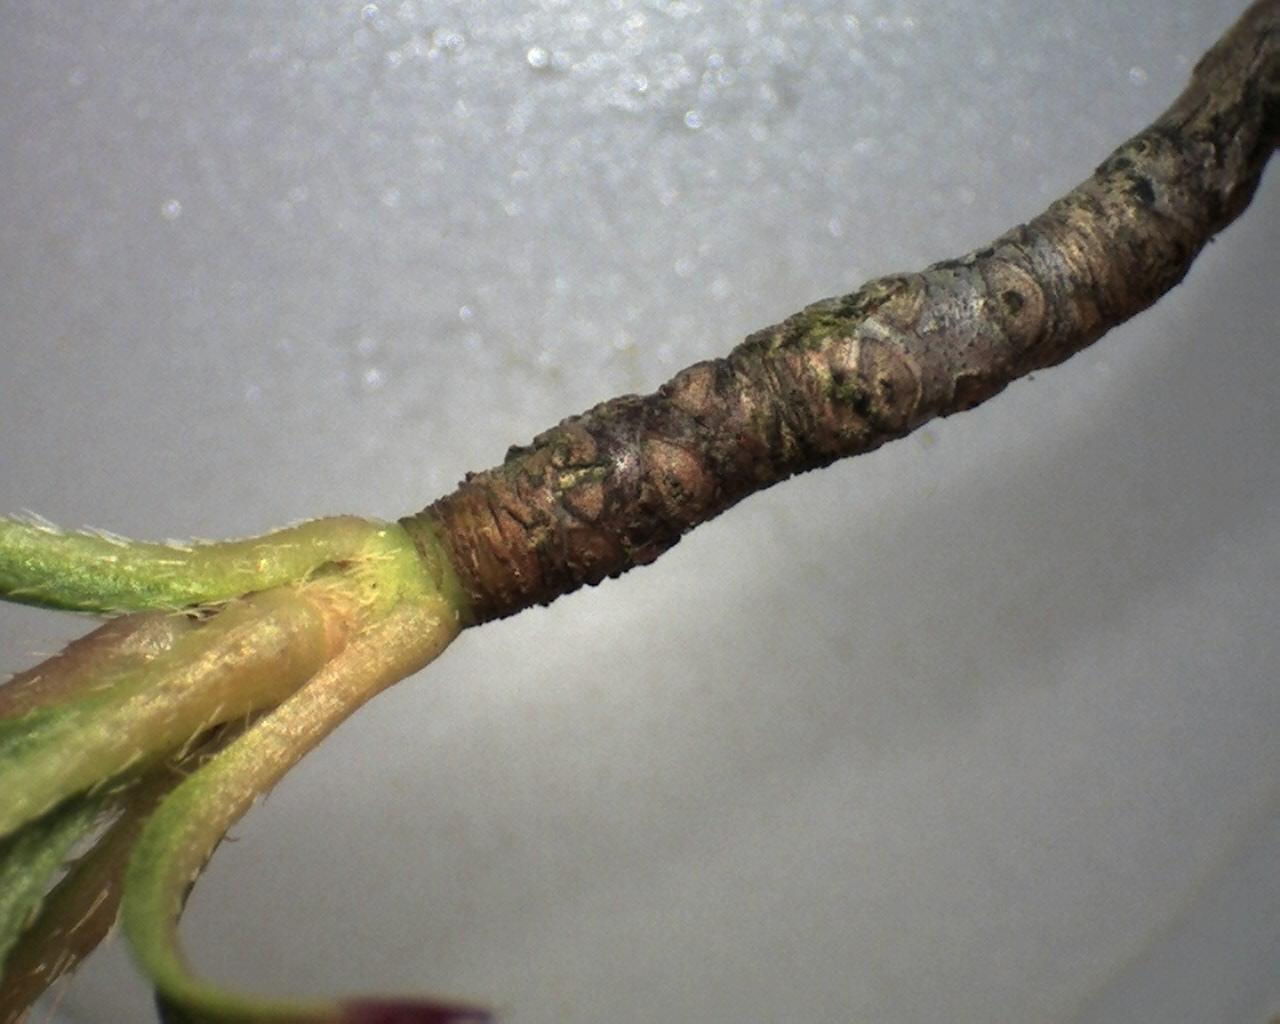 Rh. viscosum branchlet x10, Aixingarden 2016